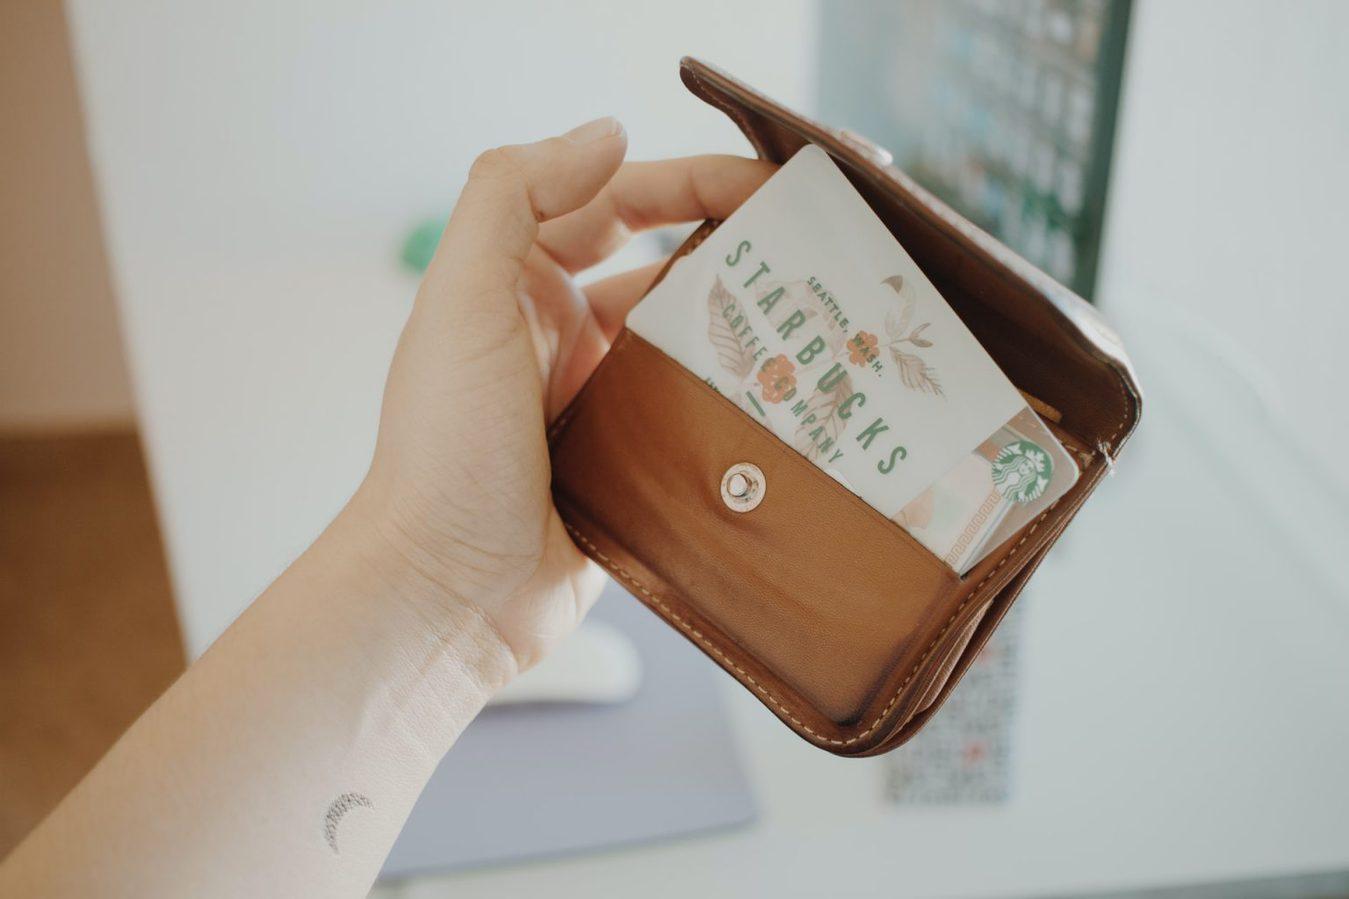 Starbucks loyalty kaart in portomonee